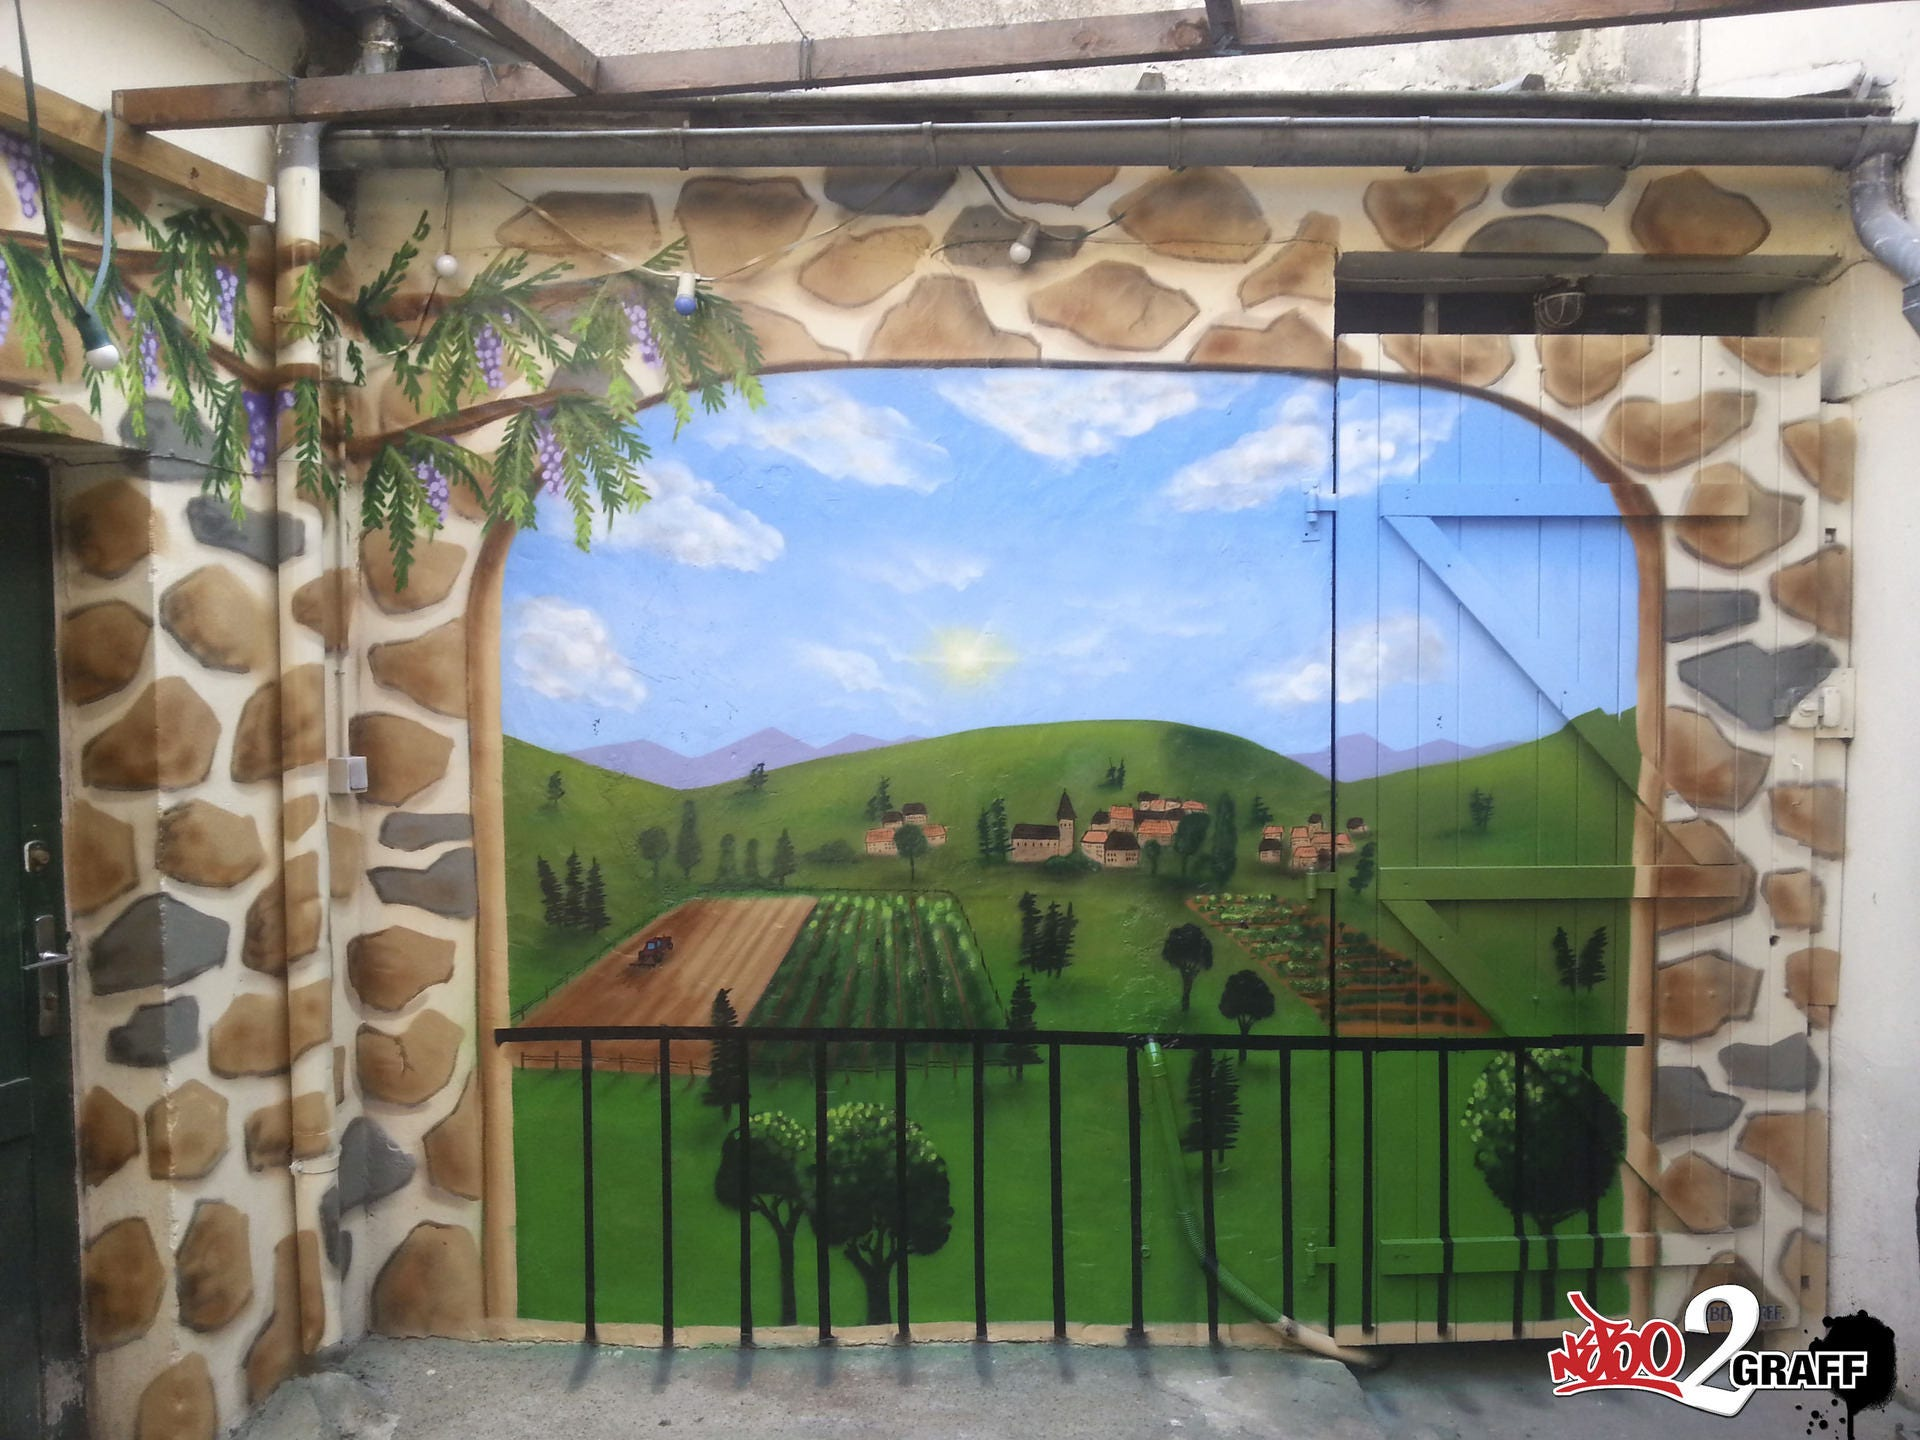 Peinture trompe l 39 oeil fresue murale graffiti graffeur - Trompe l oeil exterieur jardin ...